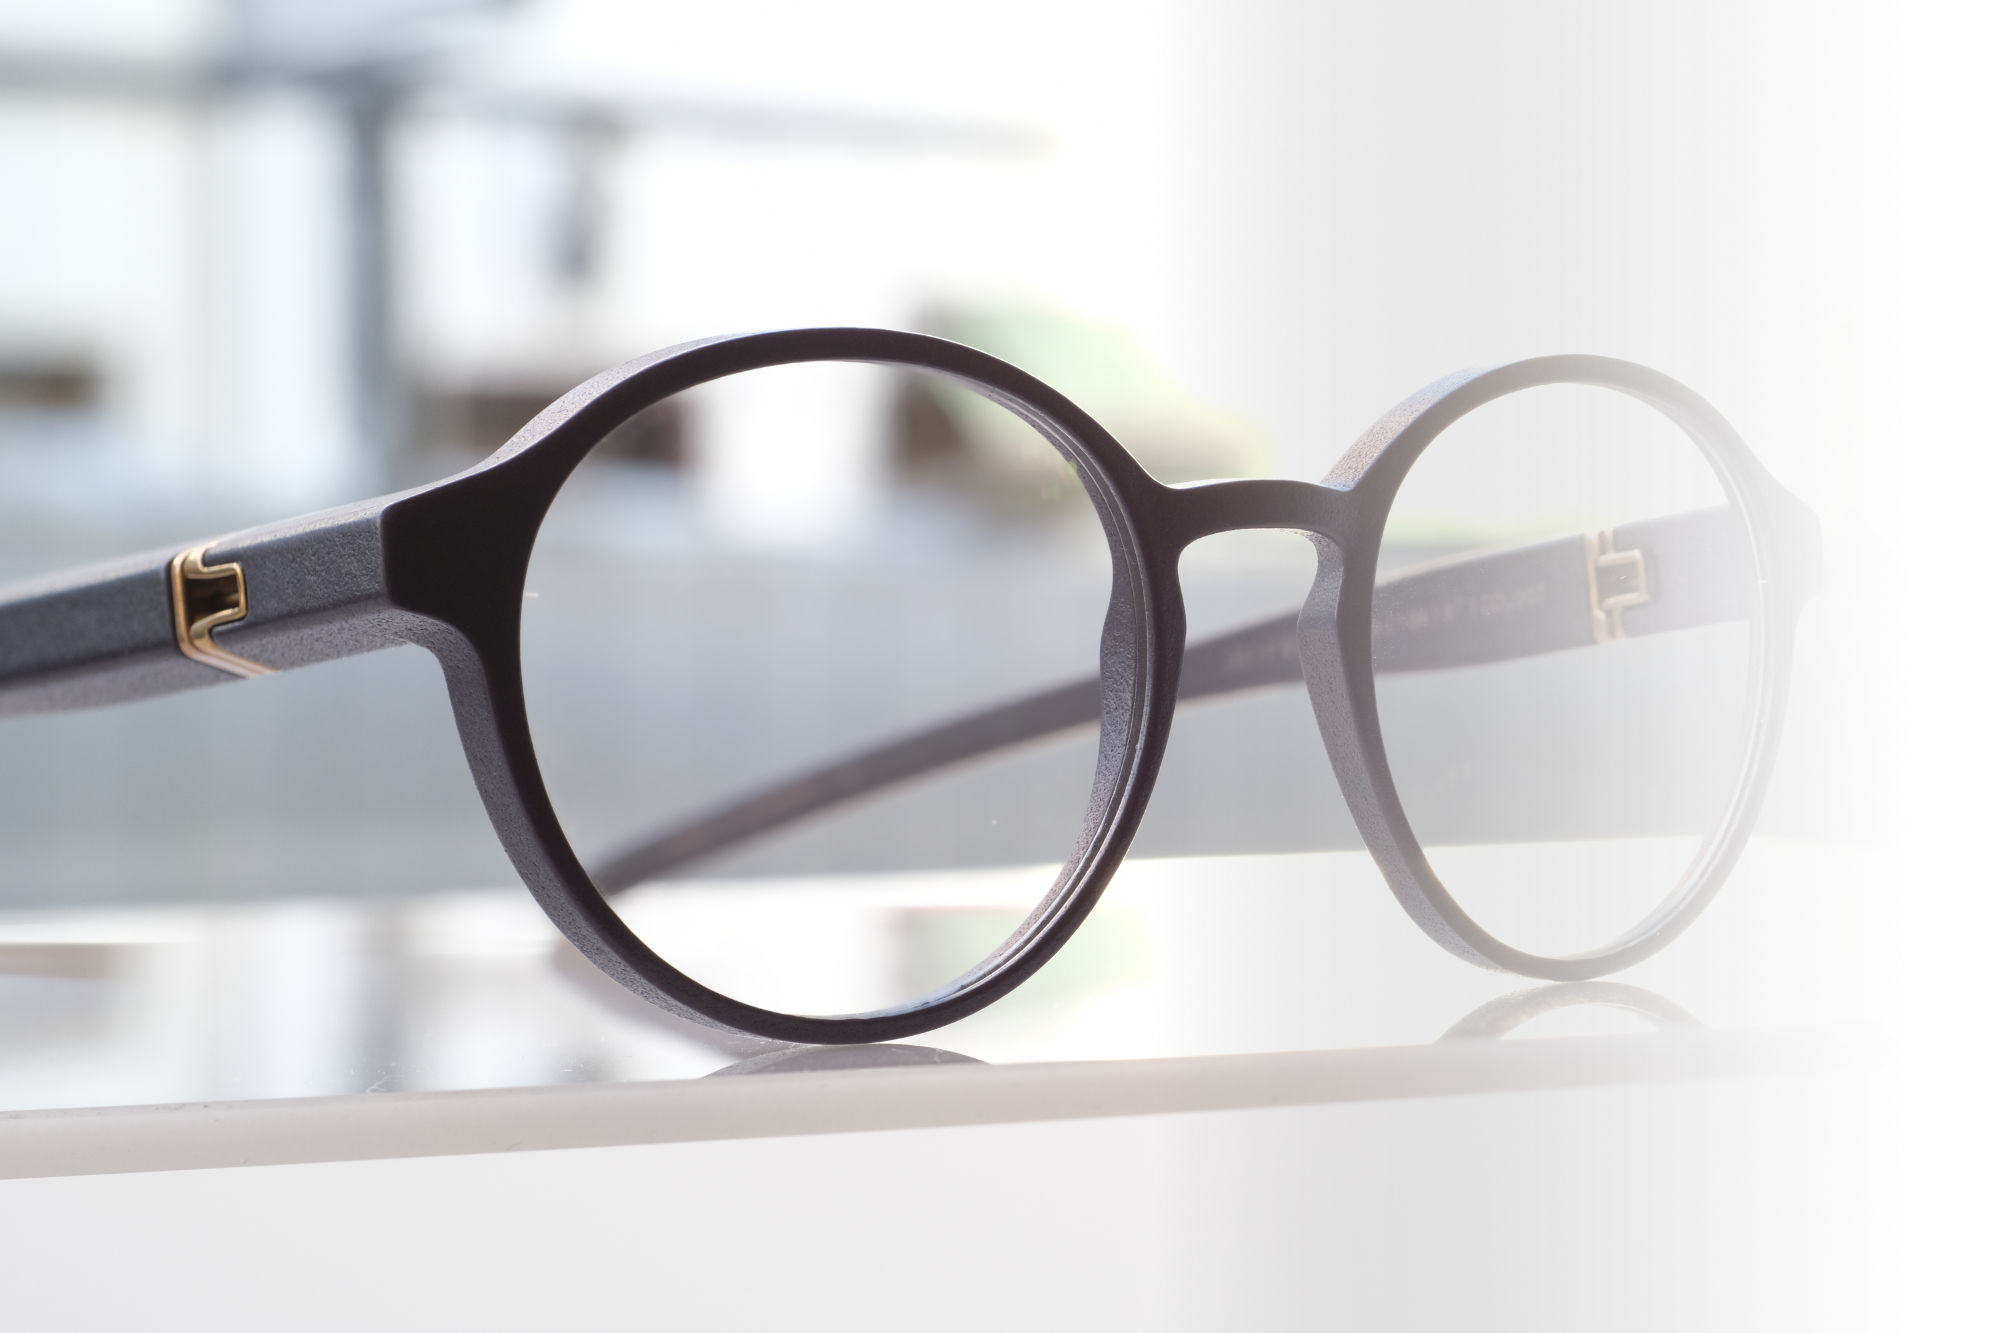 Klenze & Baum - Brentano, Modell 126 in der Farbe 007